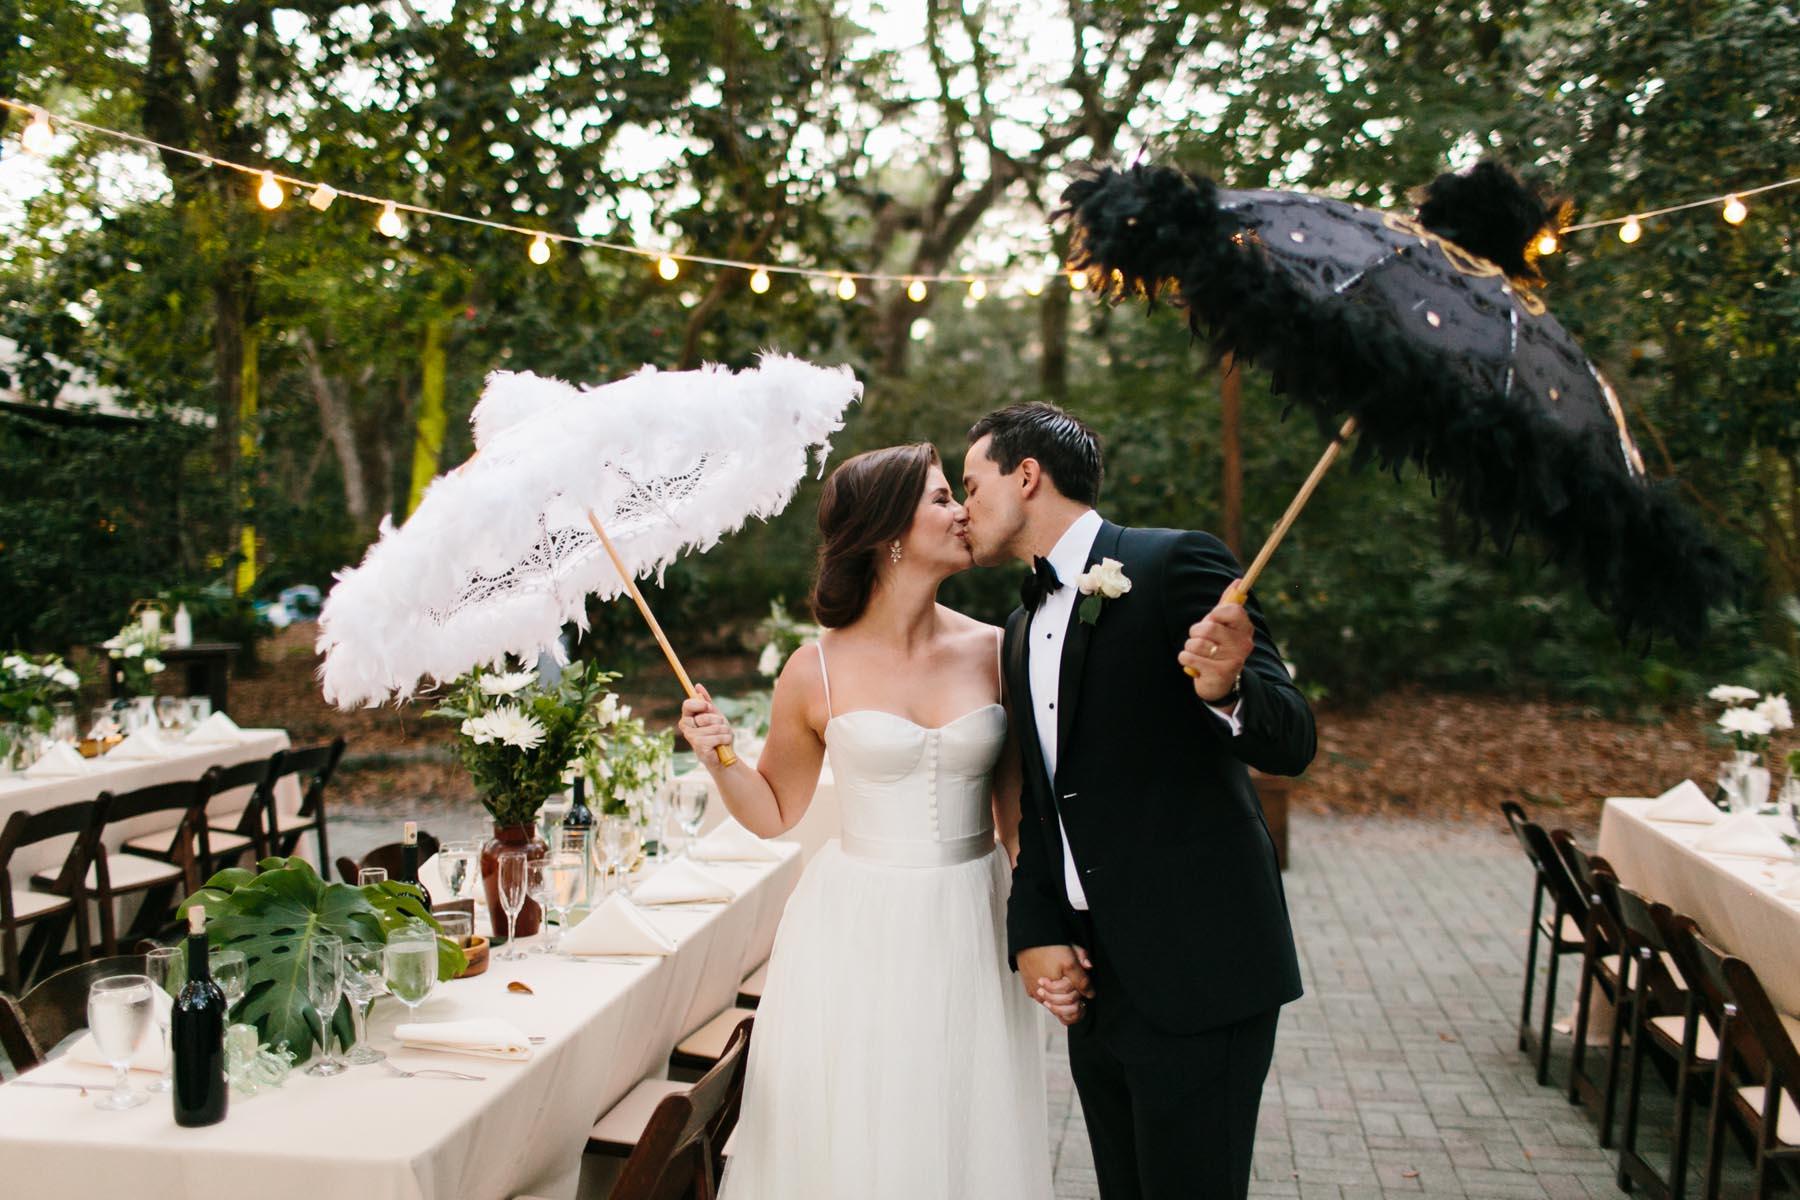 lowry wedding blog eden garden florida wedding-122